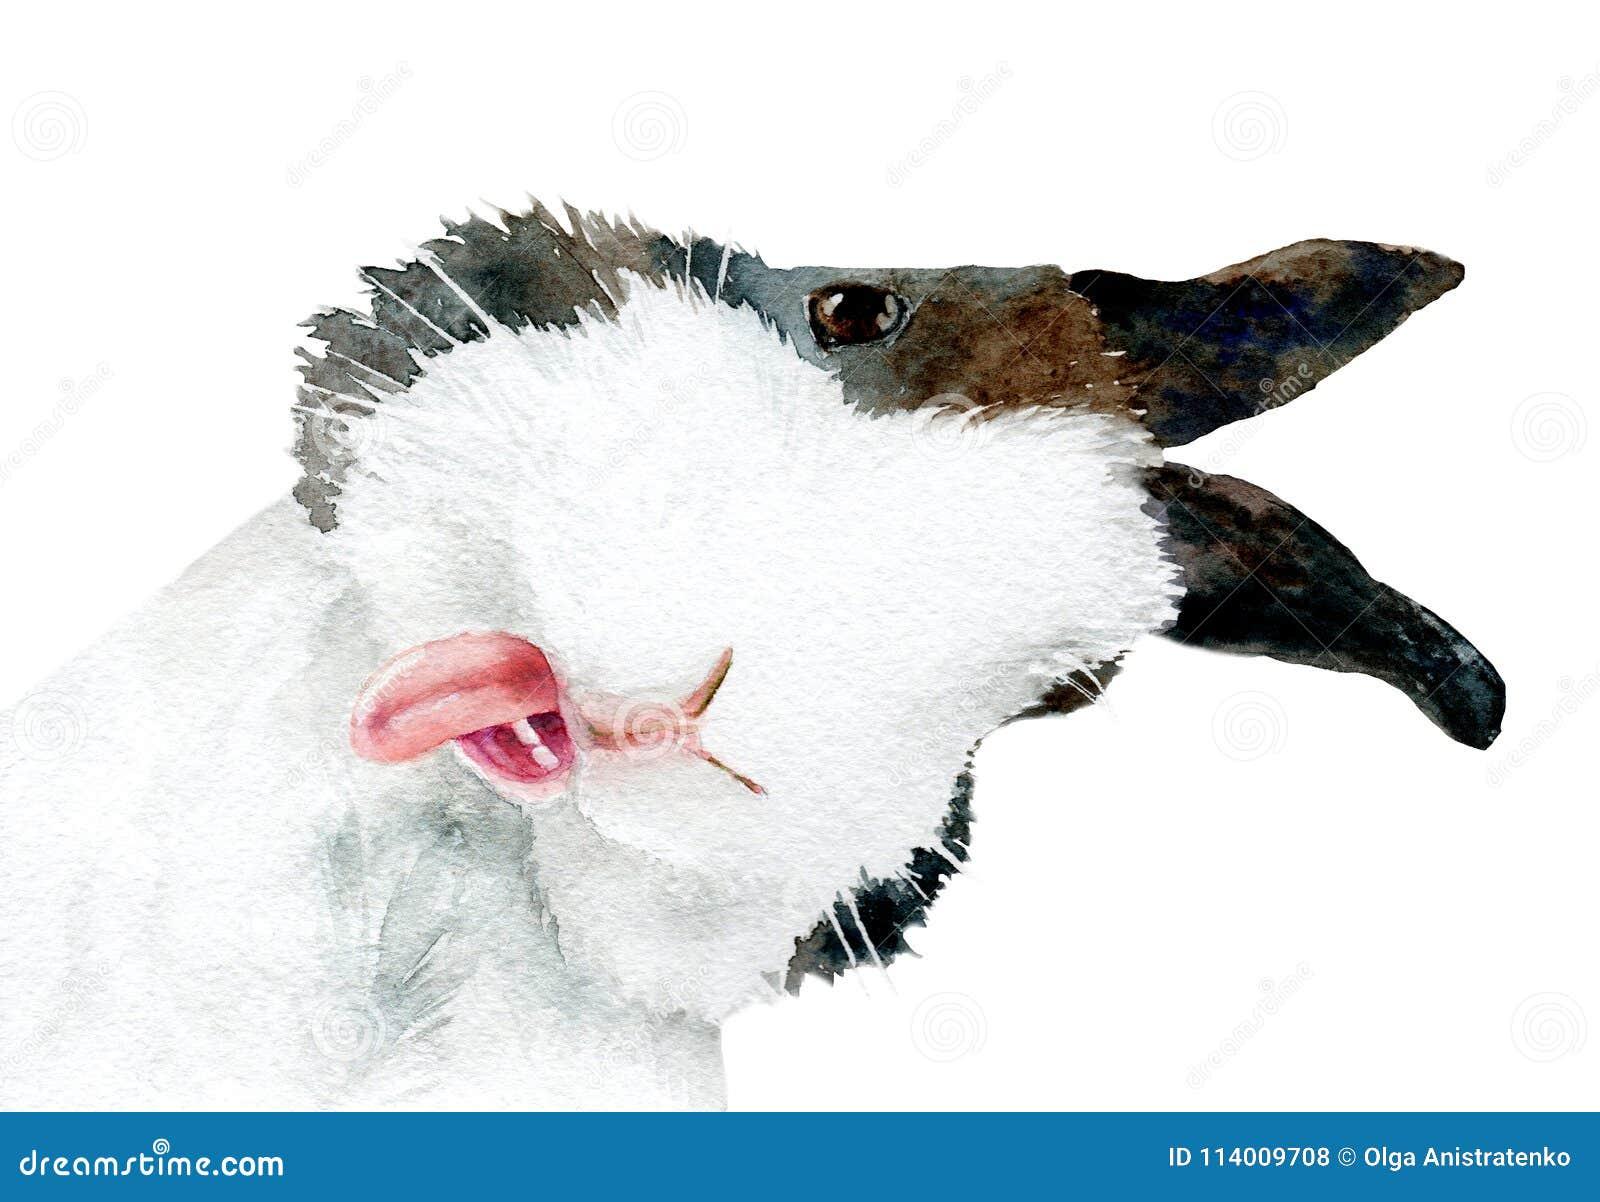 Akwarela obrazek ciekawy królik